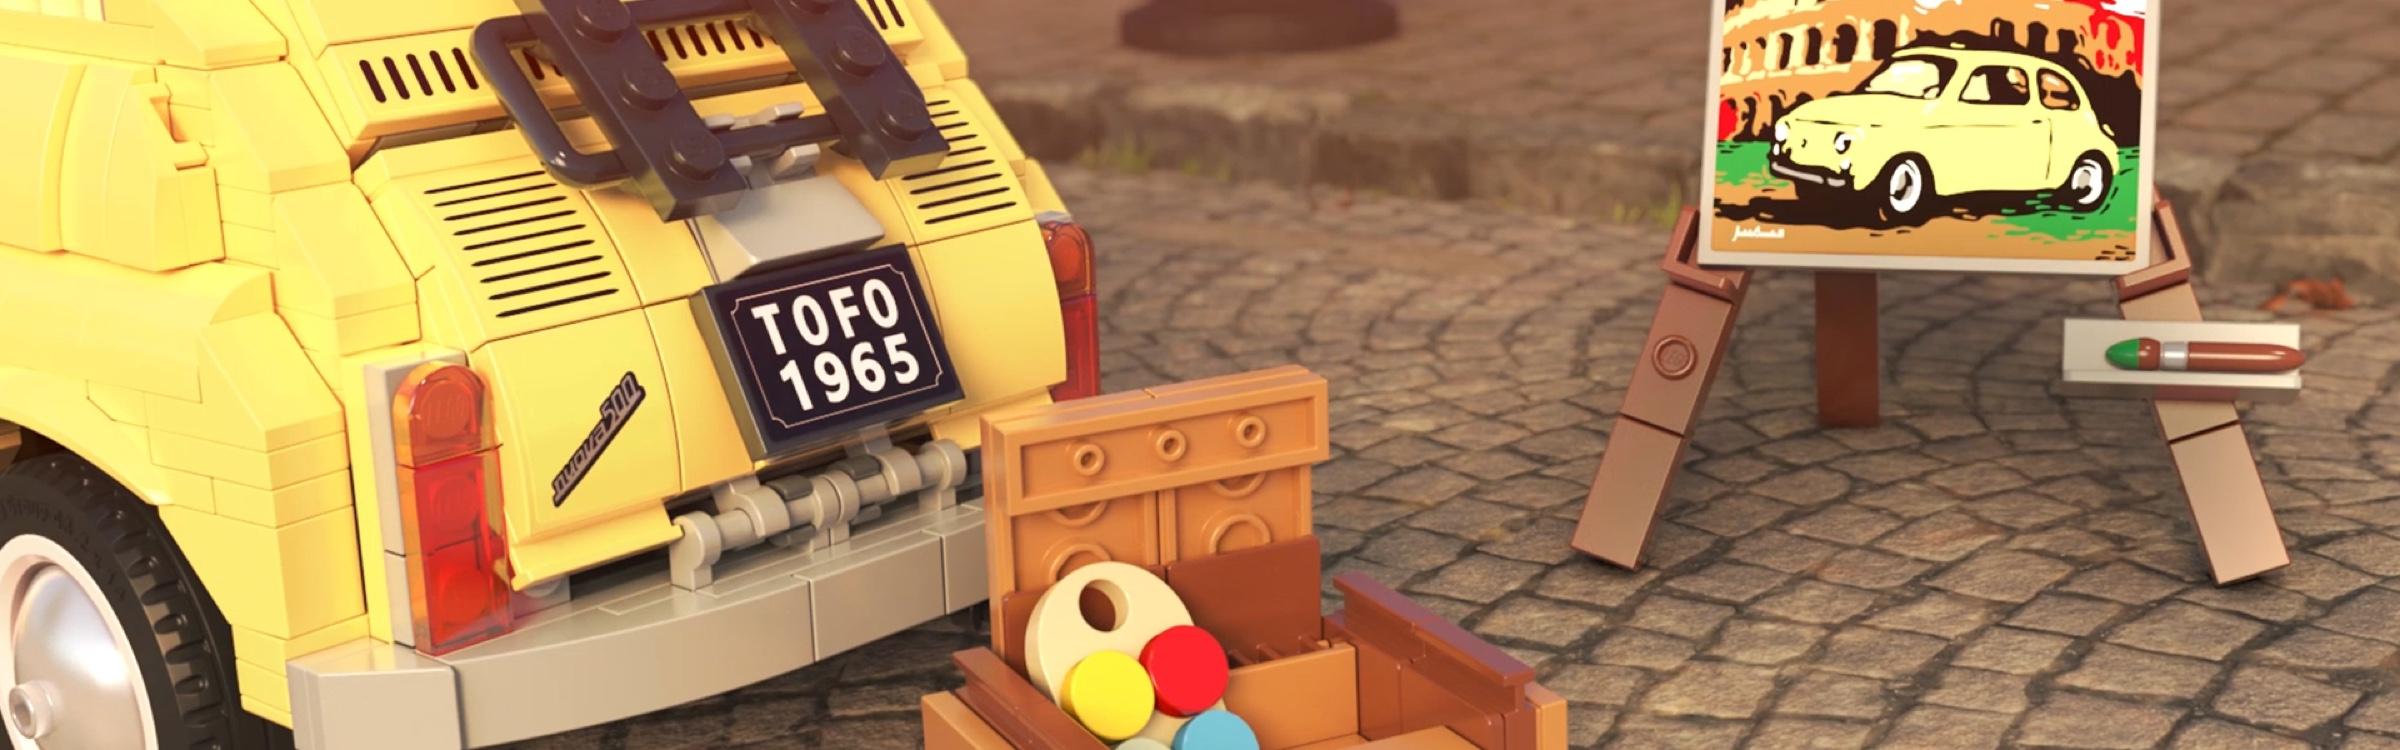 10271 Fiat 202003 Product Animation Motion Hero Still Standard Large Lego Fiat 500